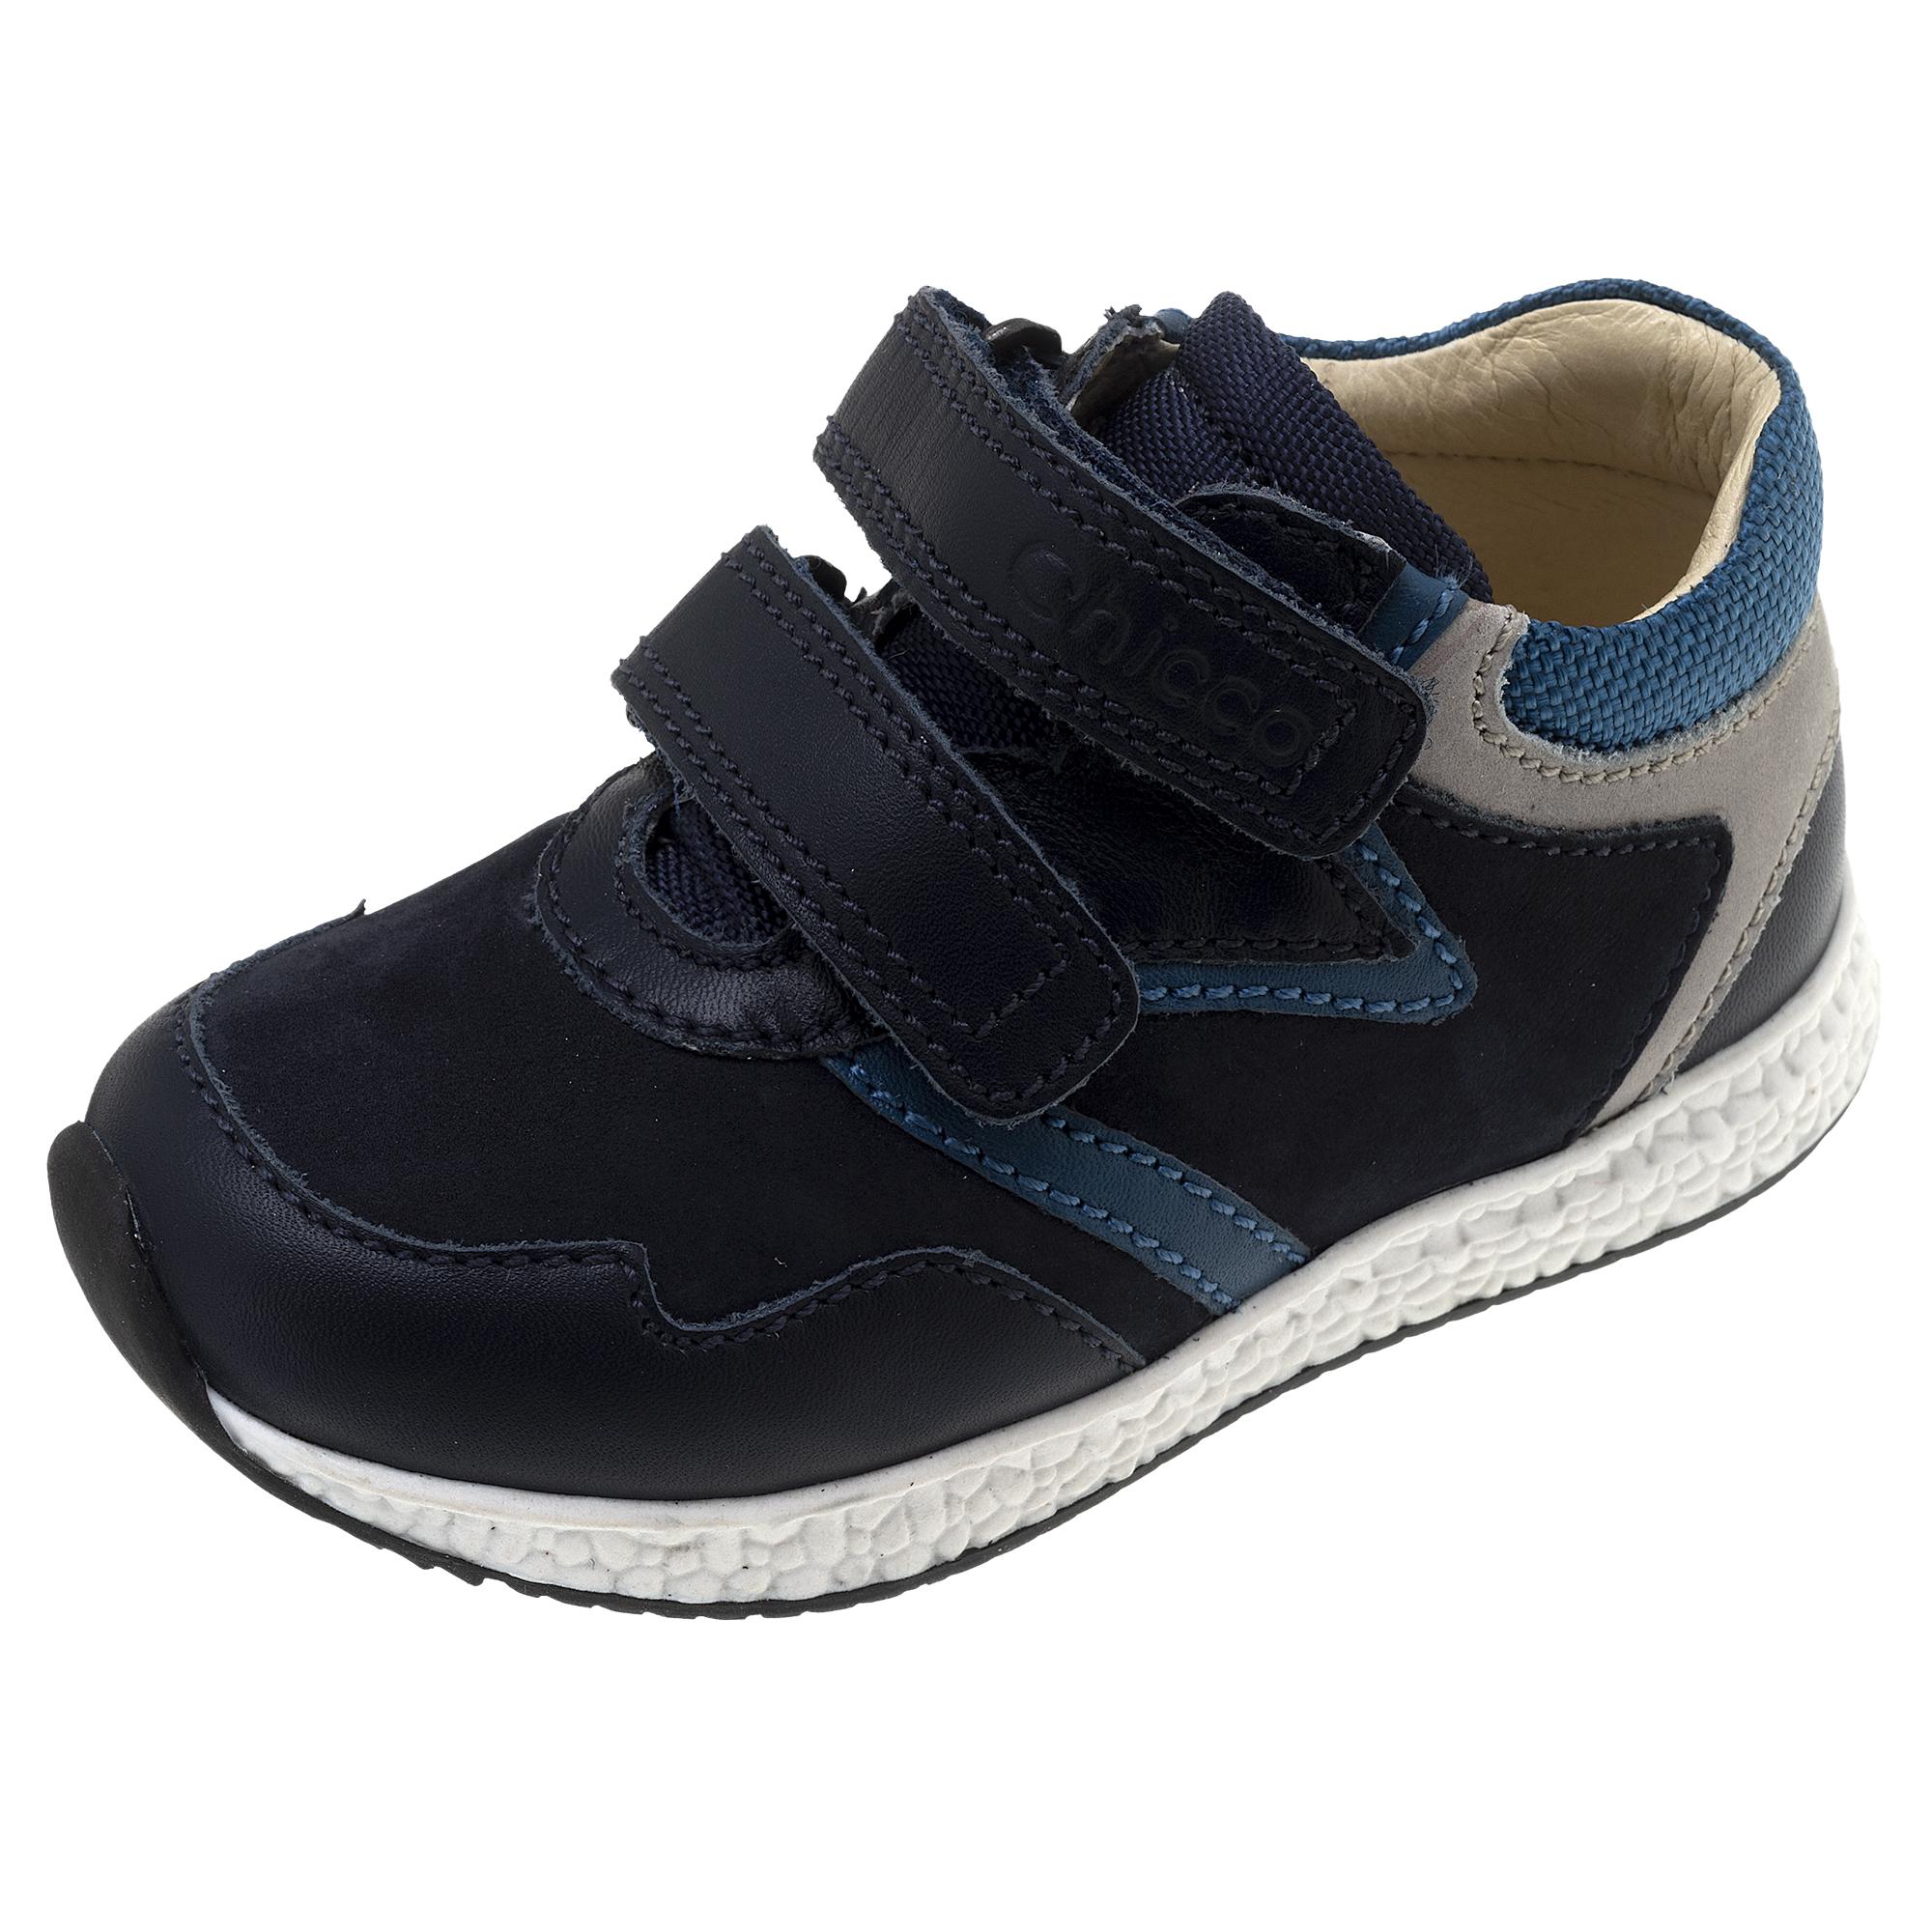 Pantofi sport copii Chicco, piele naturala, 62609